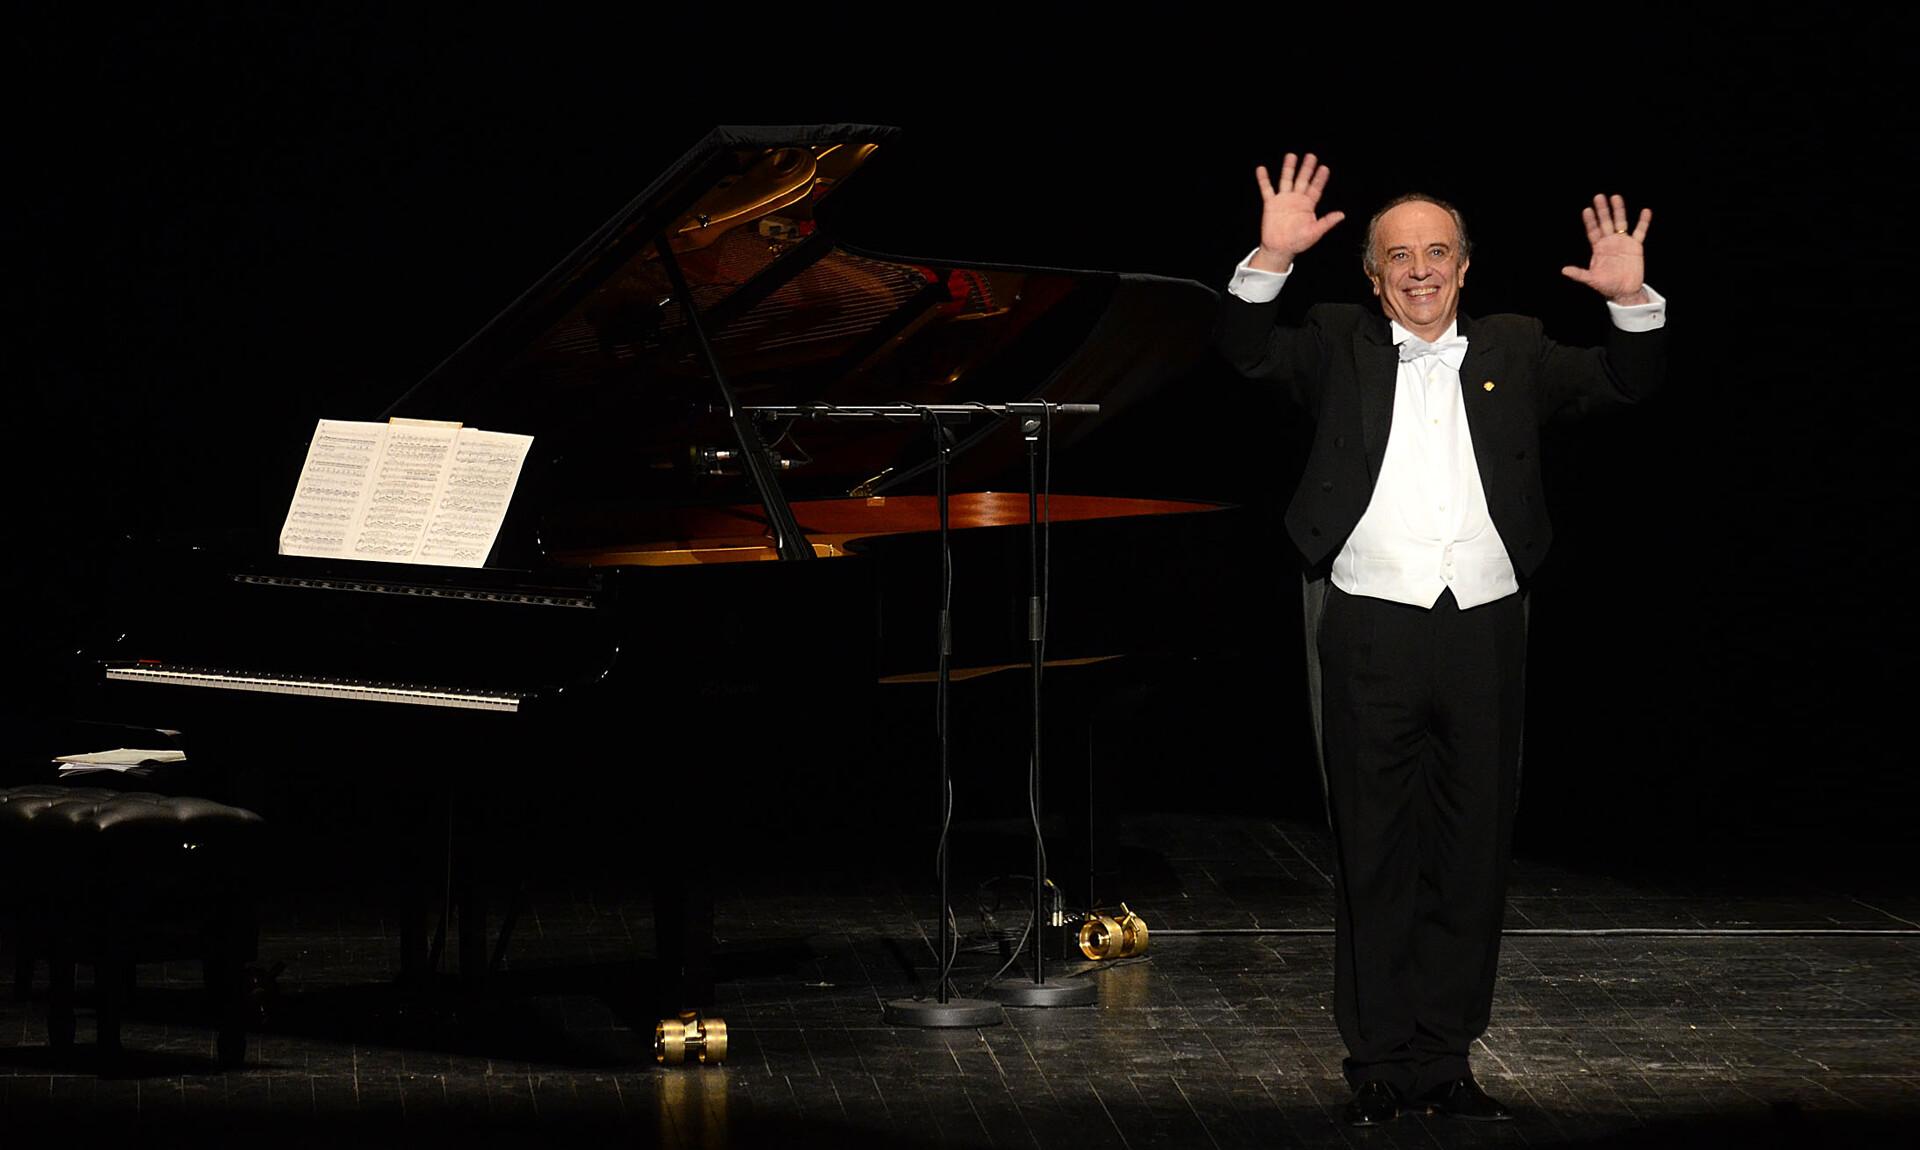 Festival Verdi 2019:Gala Verdiano  Musiche  GIUSEPPE VERDI